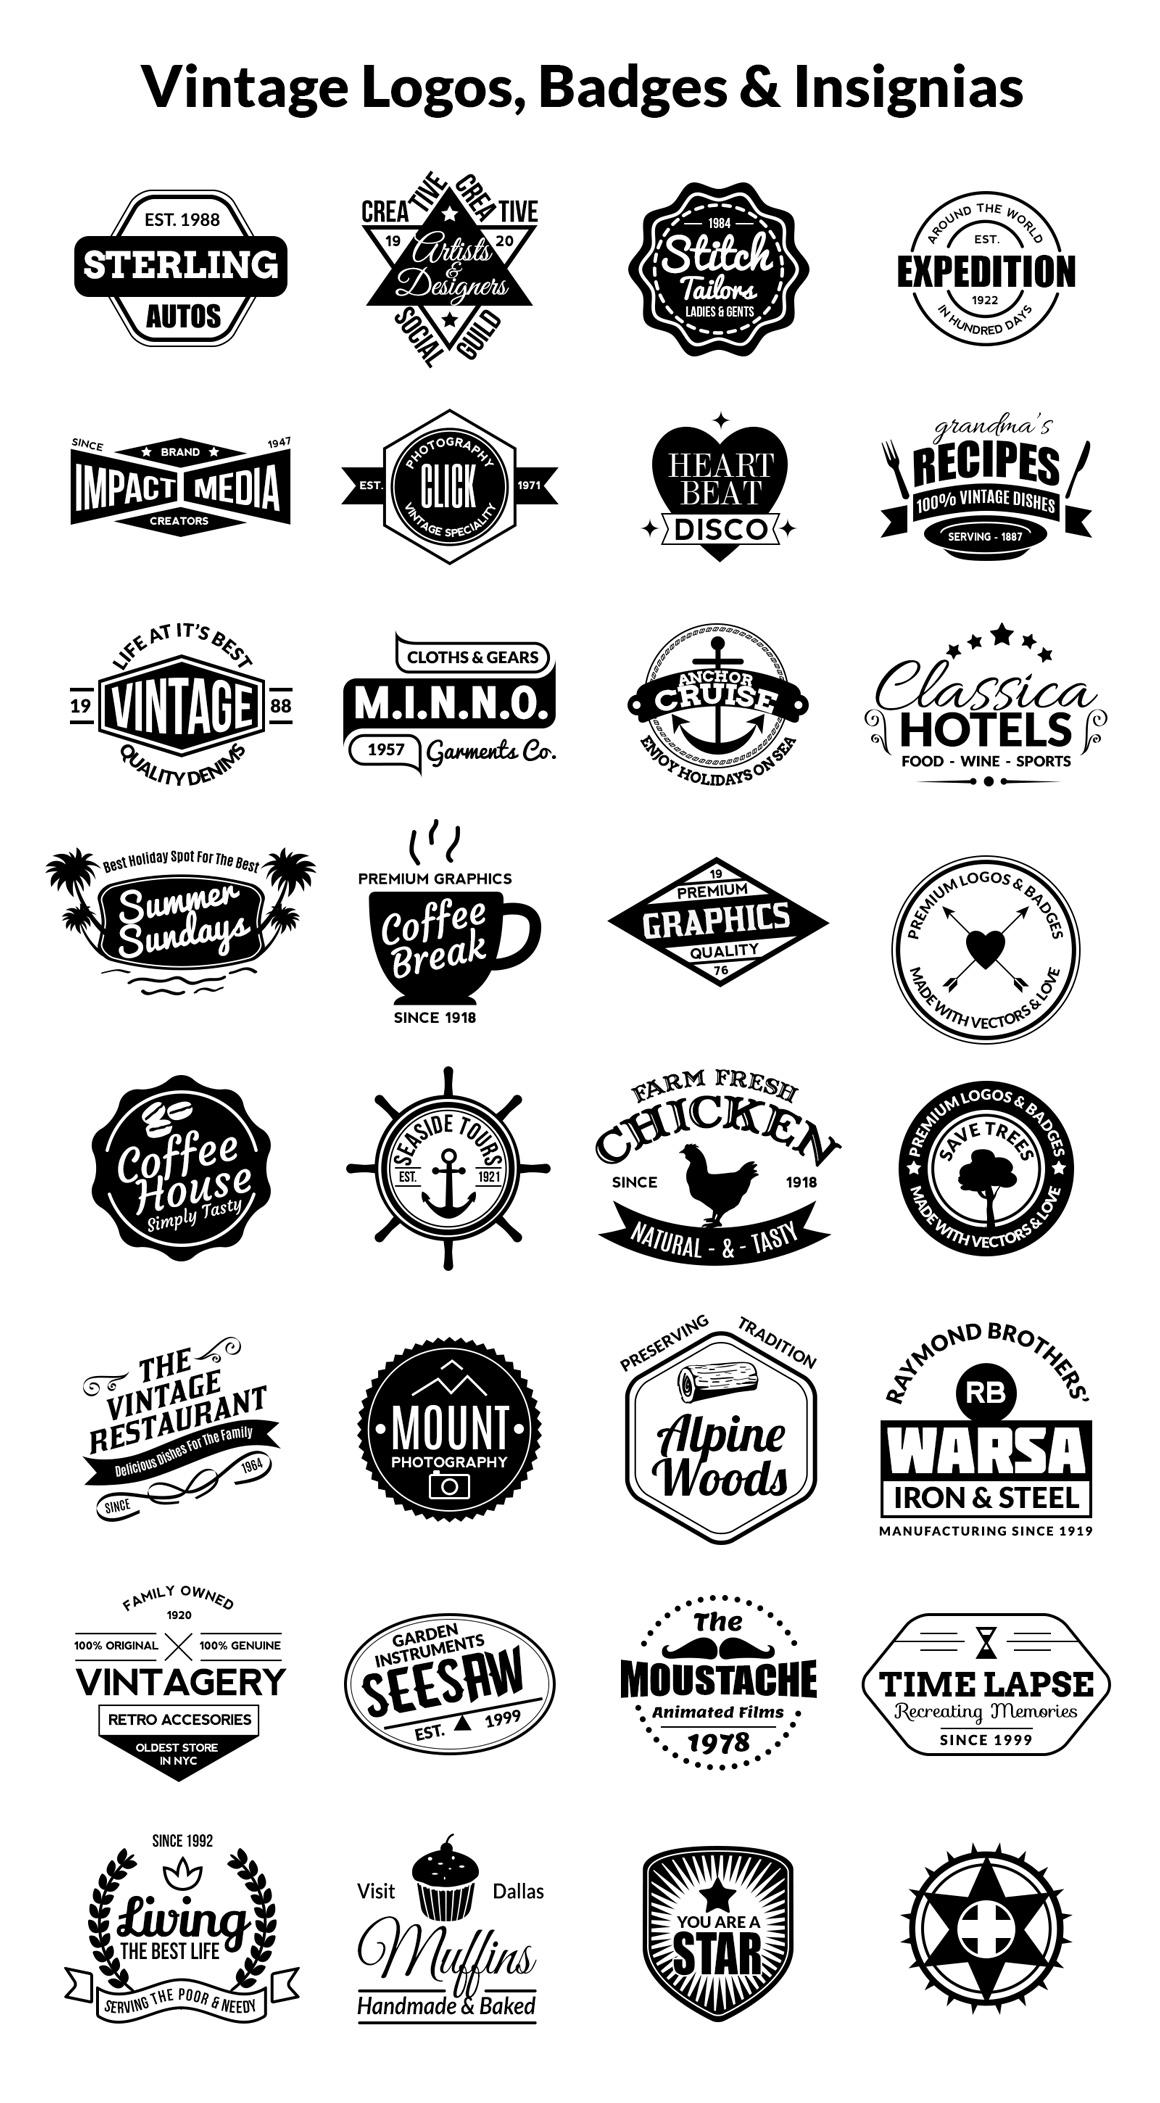 bonus-logos-badges-insignias